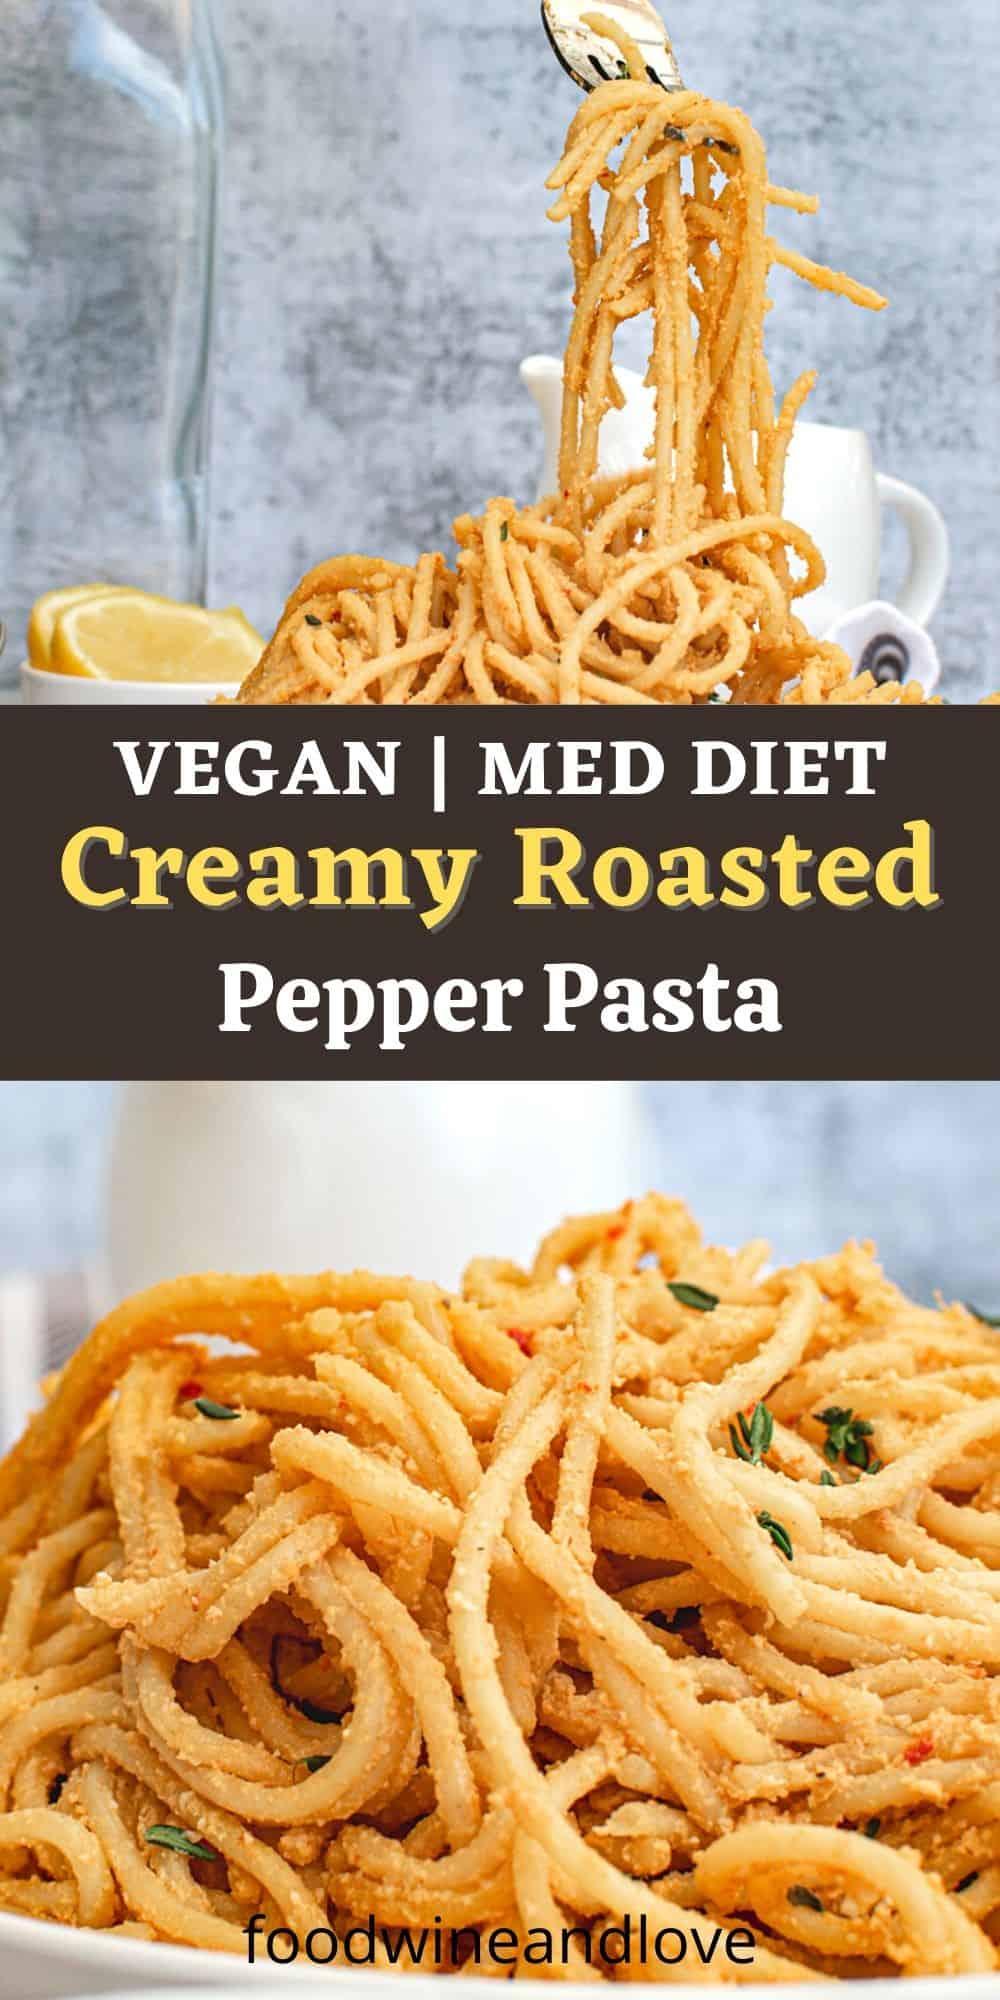 Creamy Roasted Pepper Pasta